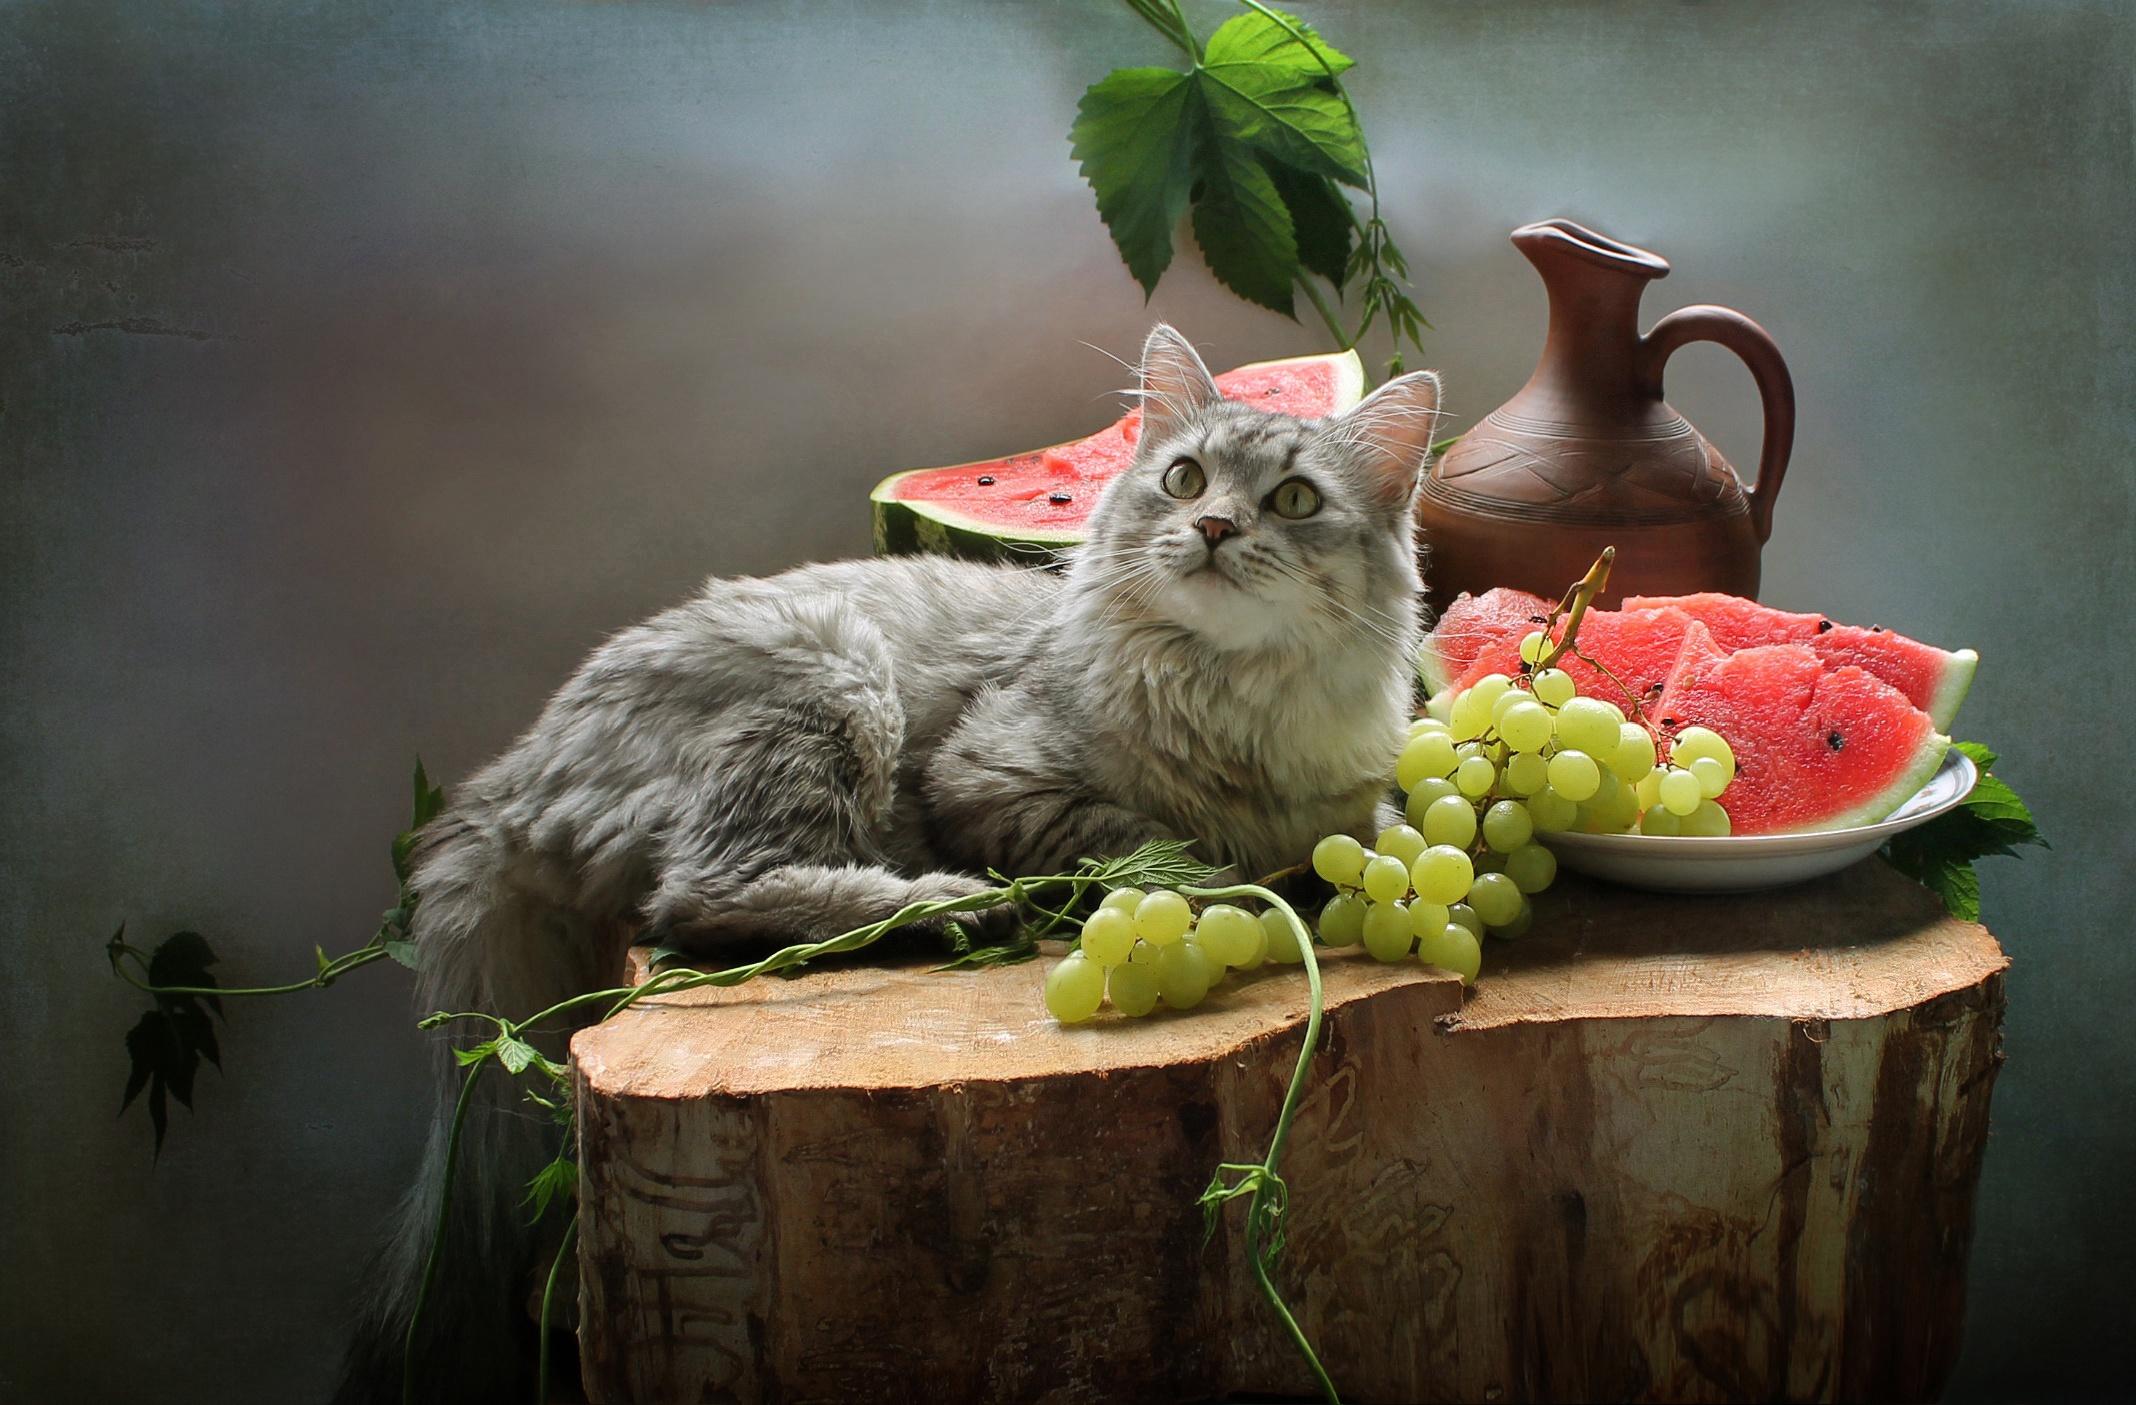 картинки котики с фруктами дачнику ландшафтном